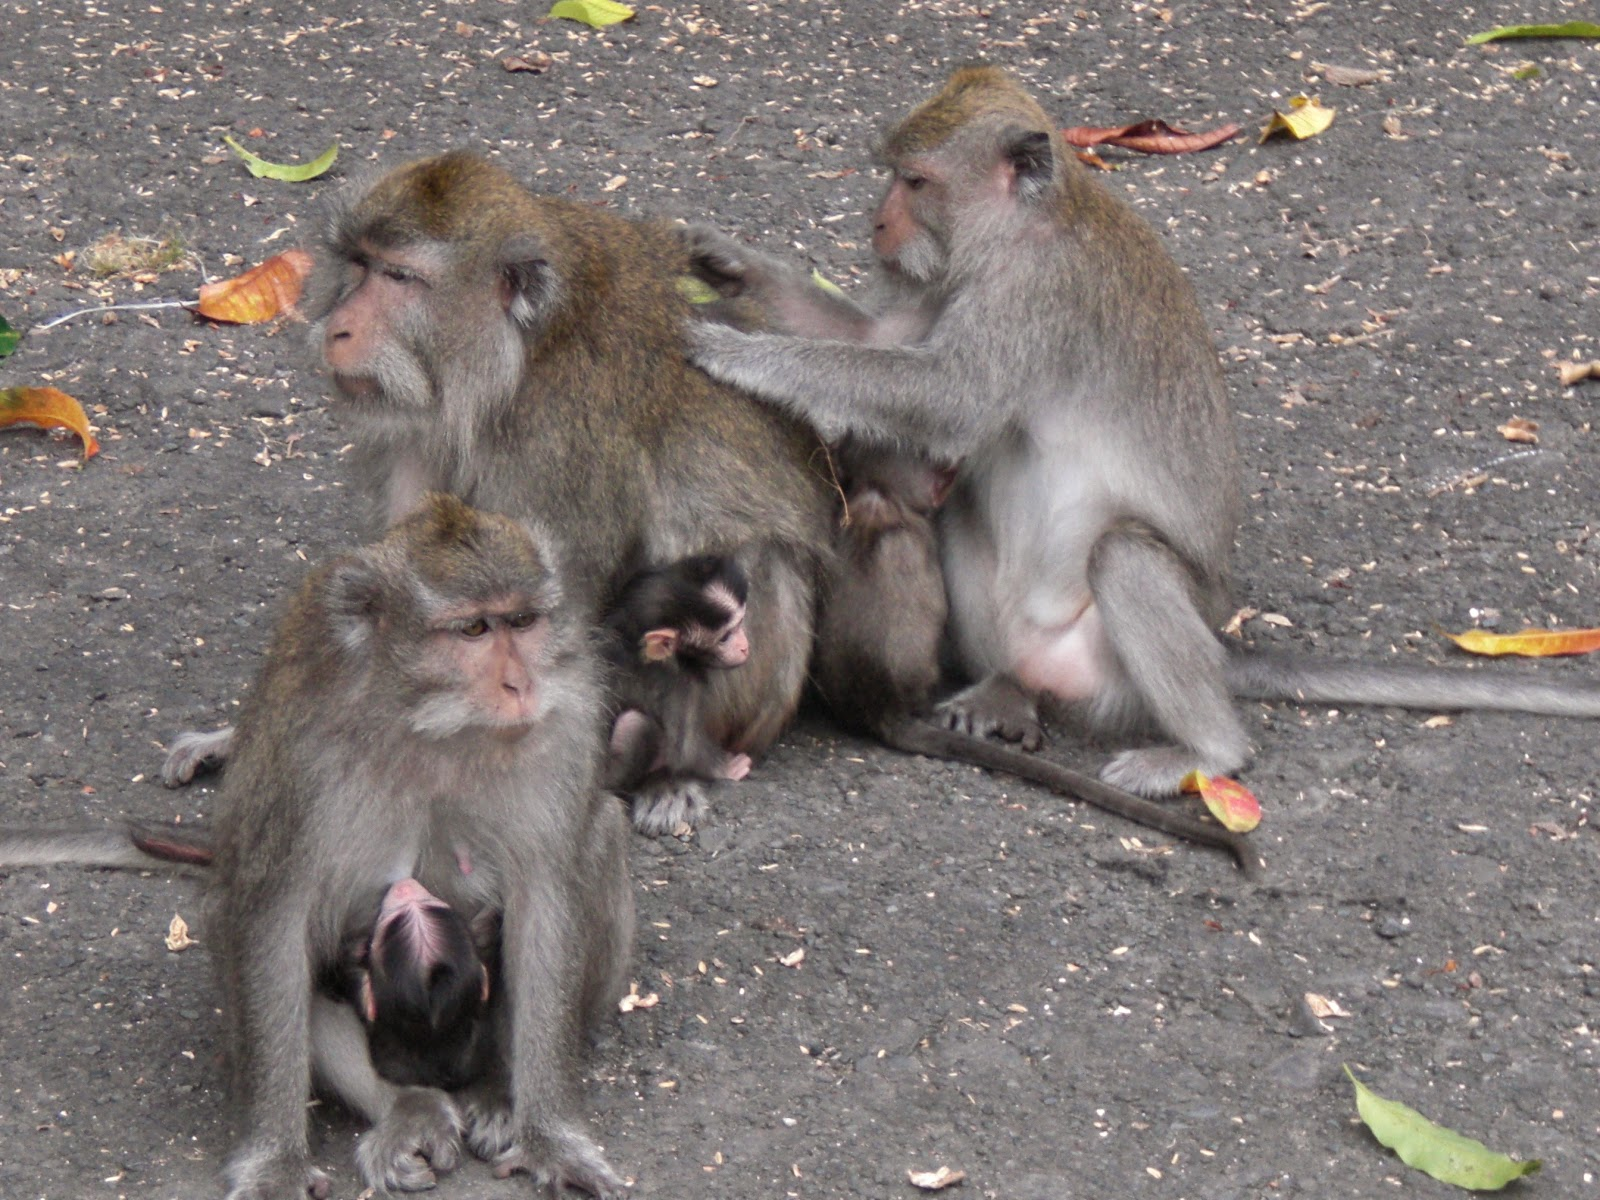 monyet di monkey forest bali, serangan monyet bali, kebiasaan monyet bali